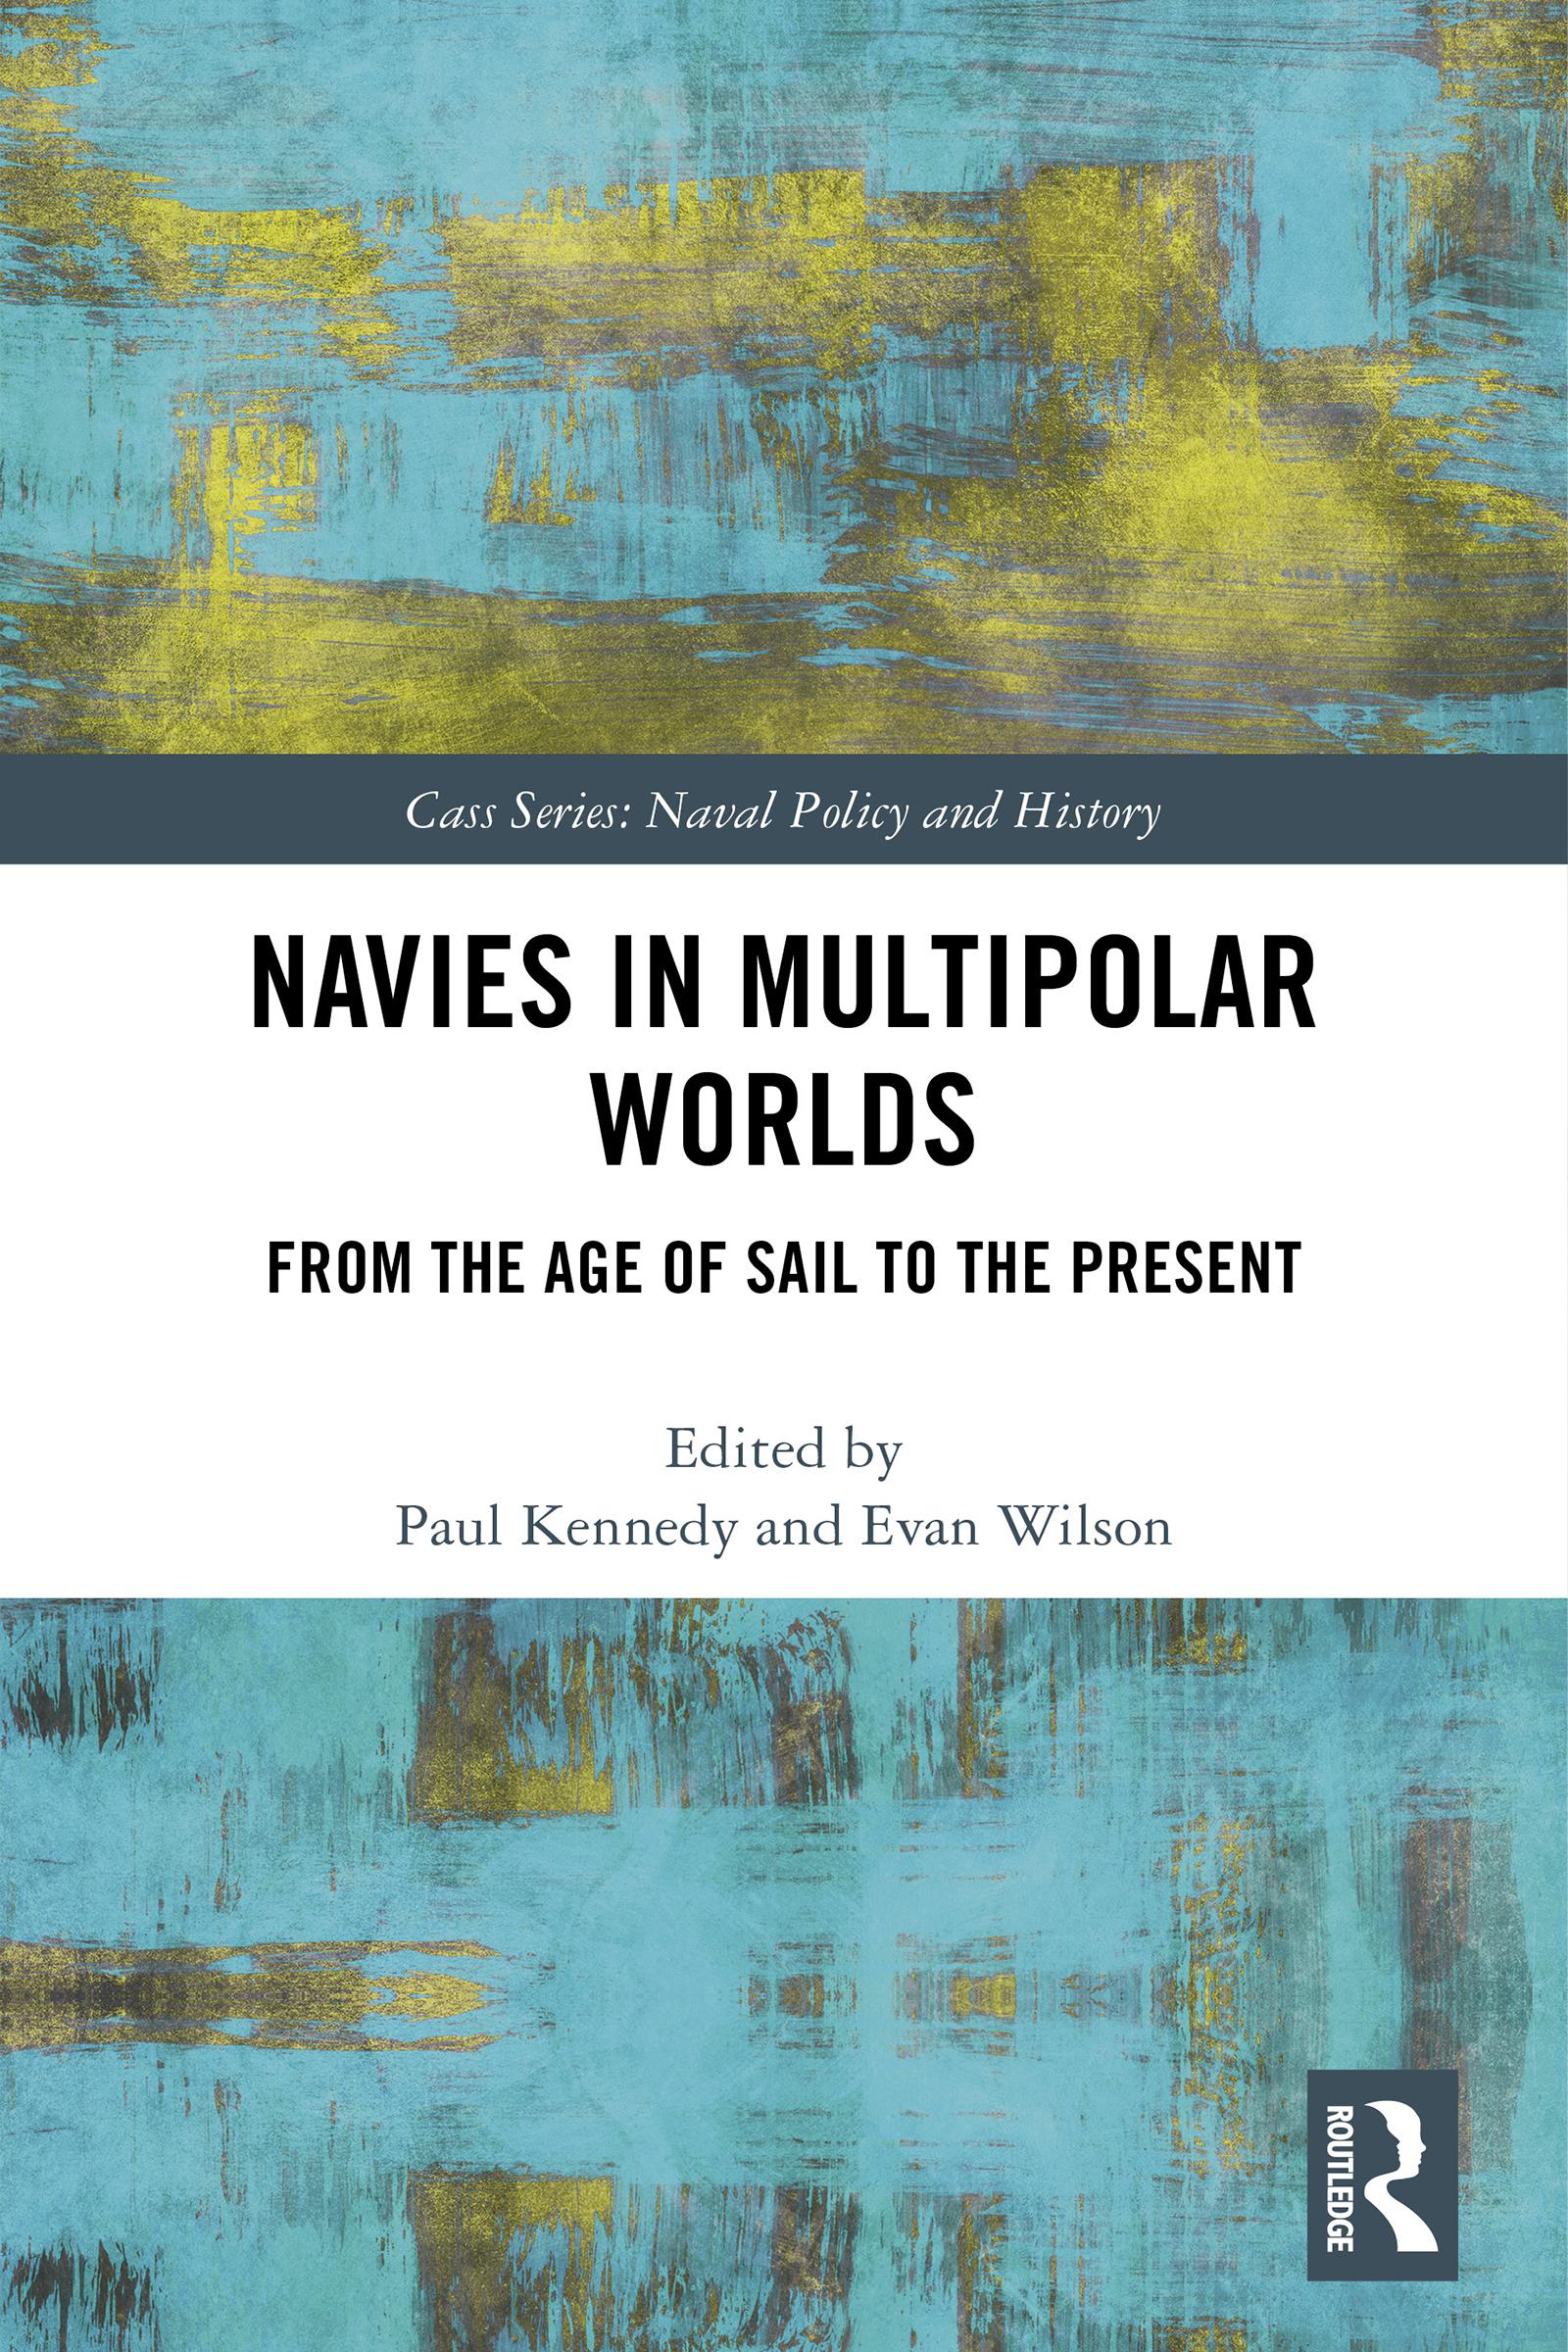 Navies in Multipolar Worlds